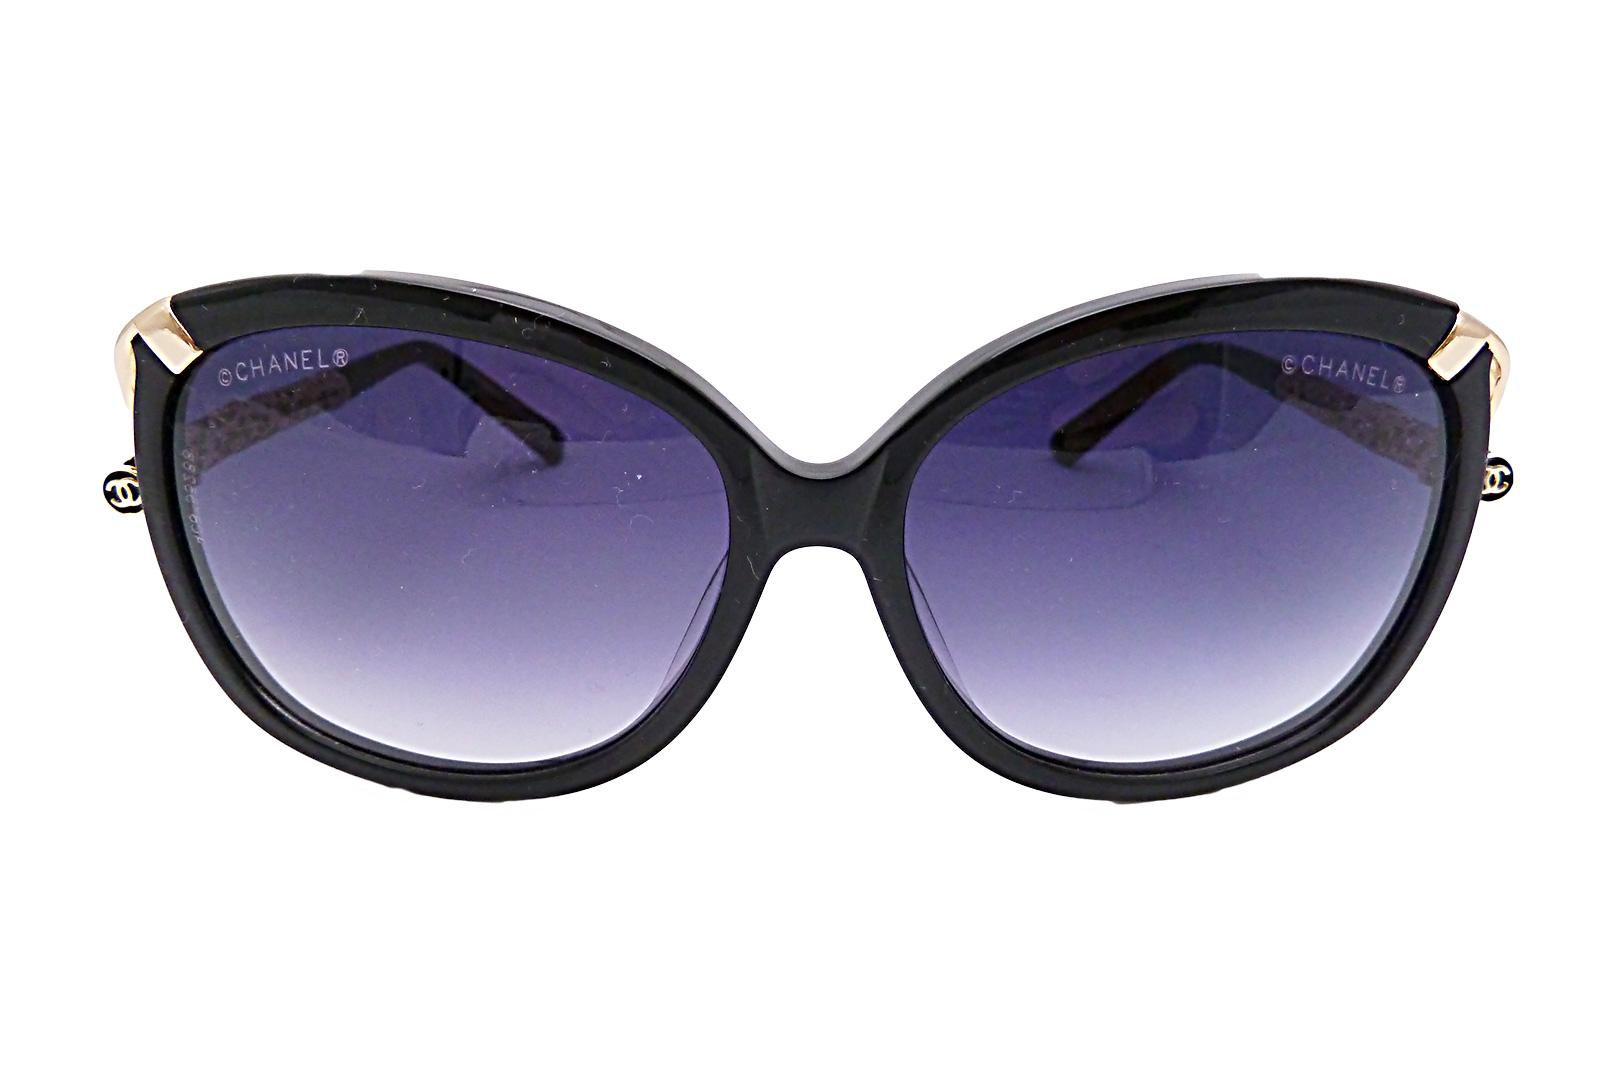 Gold Frame Chanel Sunglasses : Auth Chanel CC Logo Sunglasses Black Pink Gold Frame ...